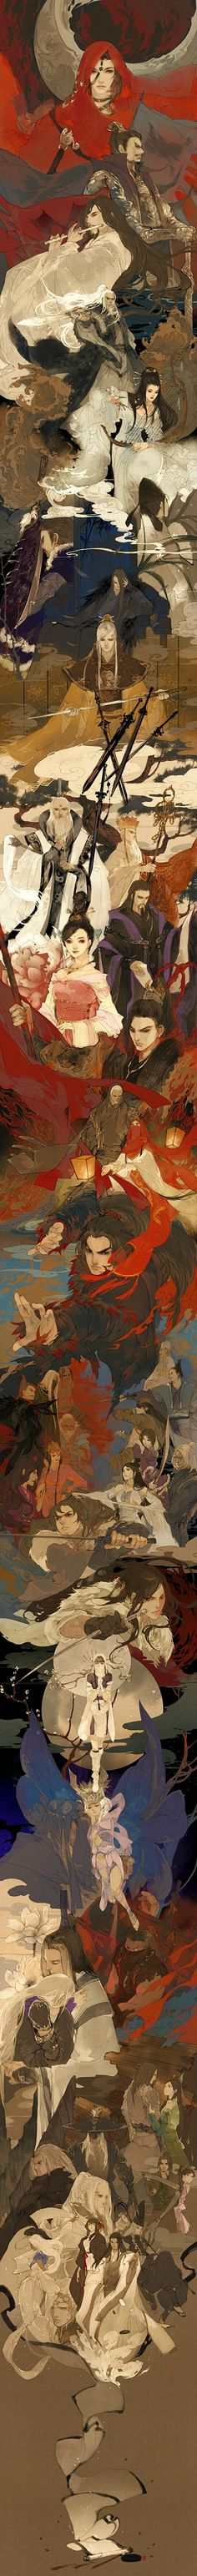 ibuki satsuki's artwork